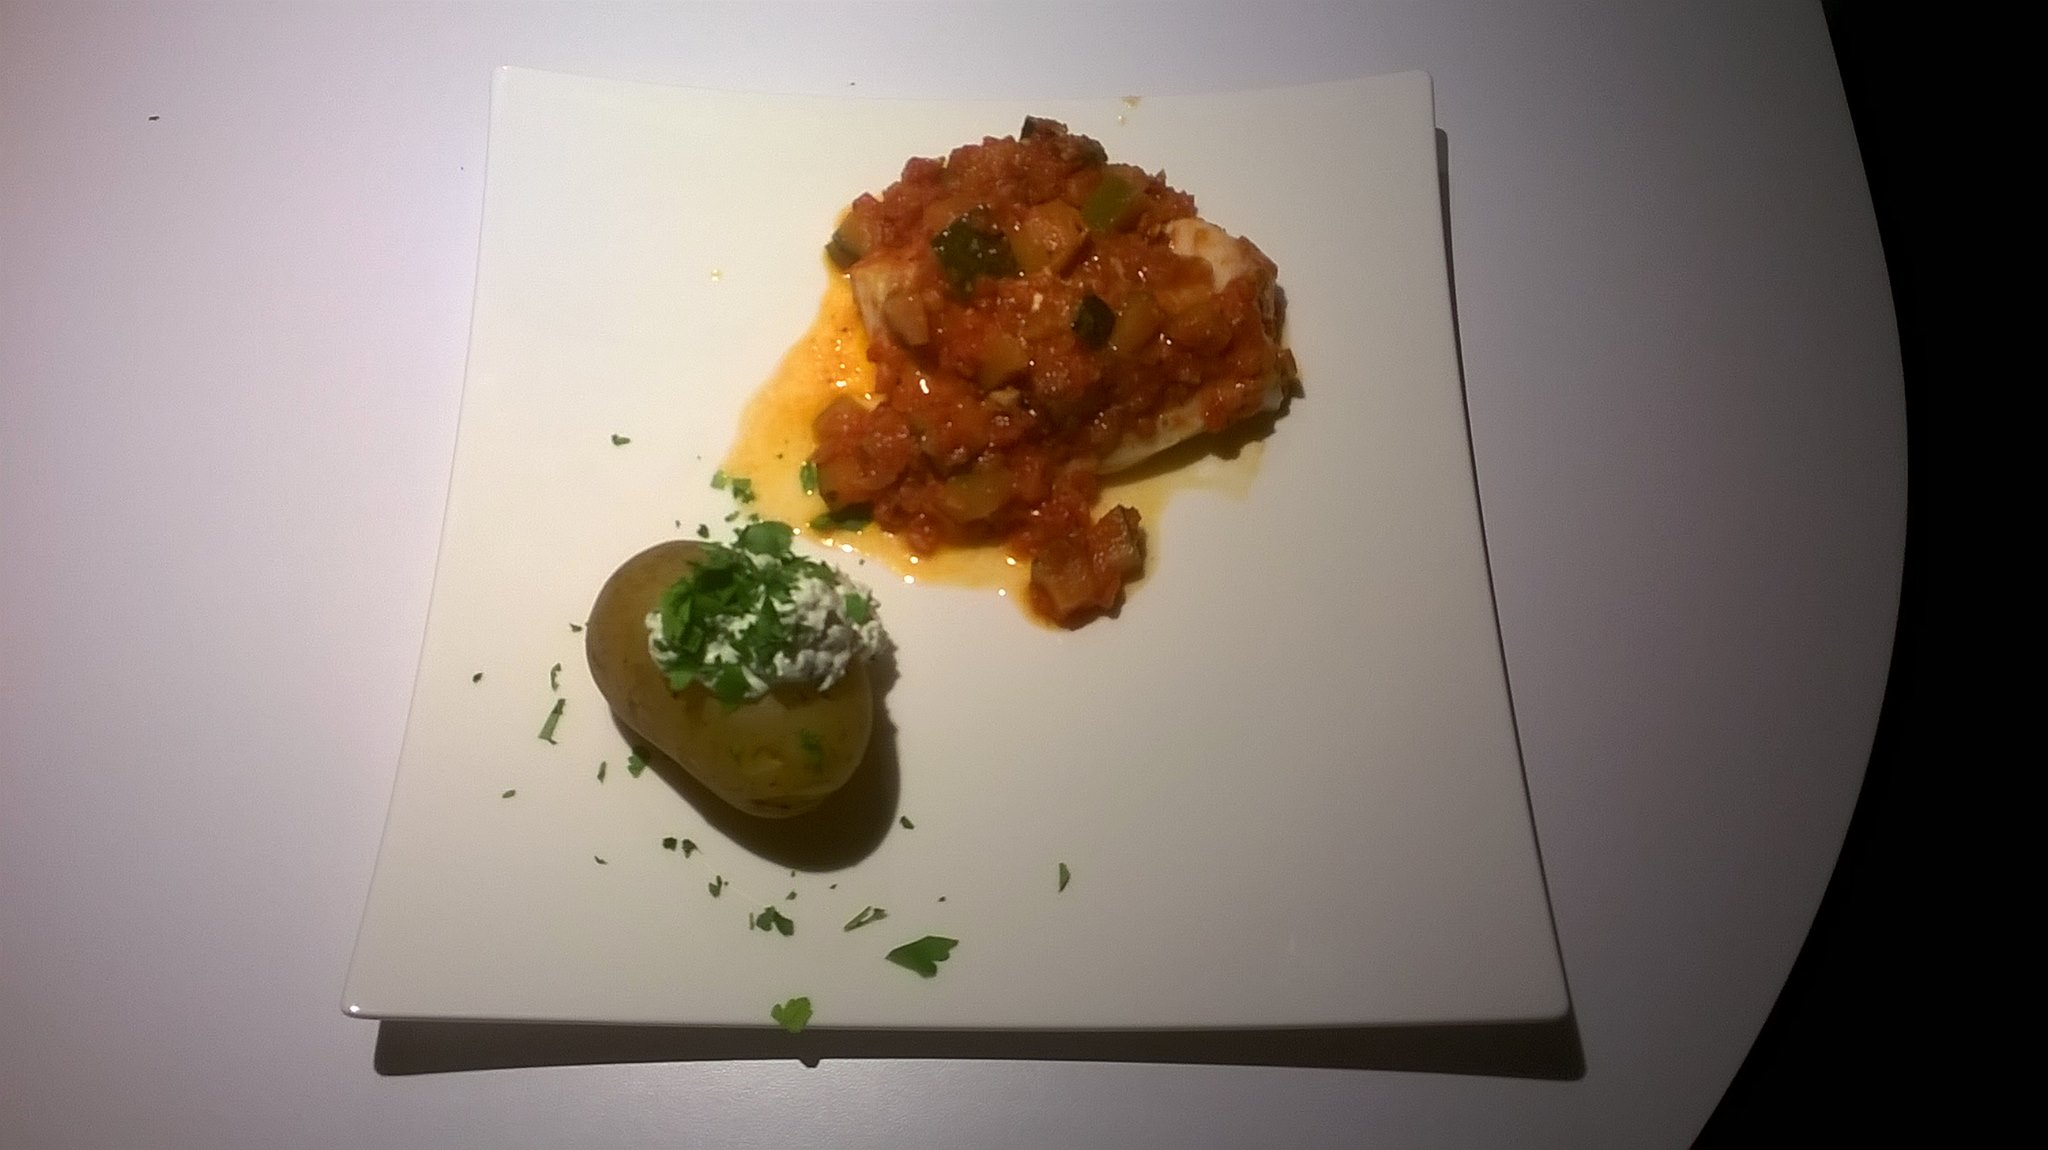 Kabeljauw in tomatensausje met ricotta-aardappelen.